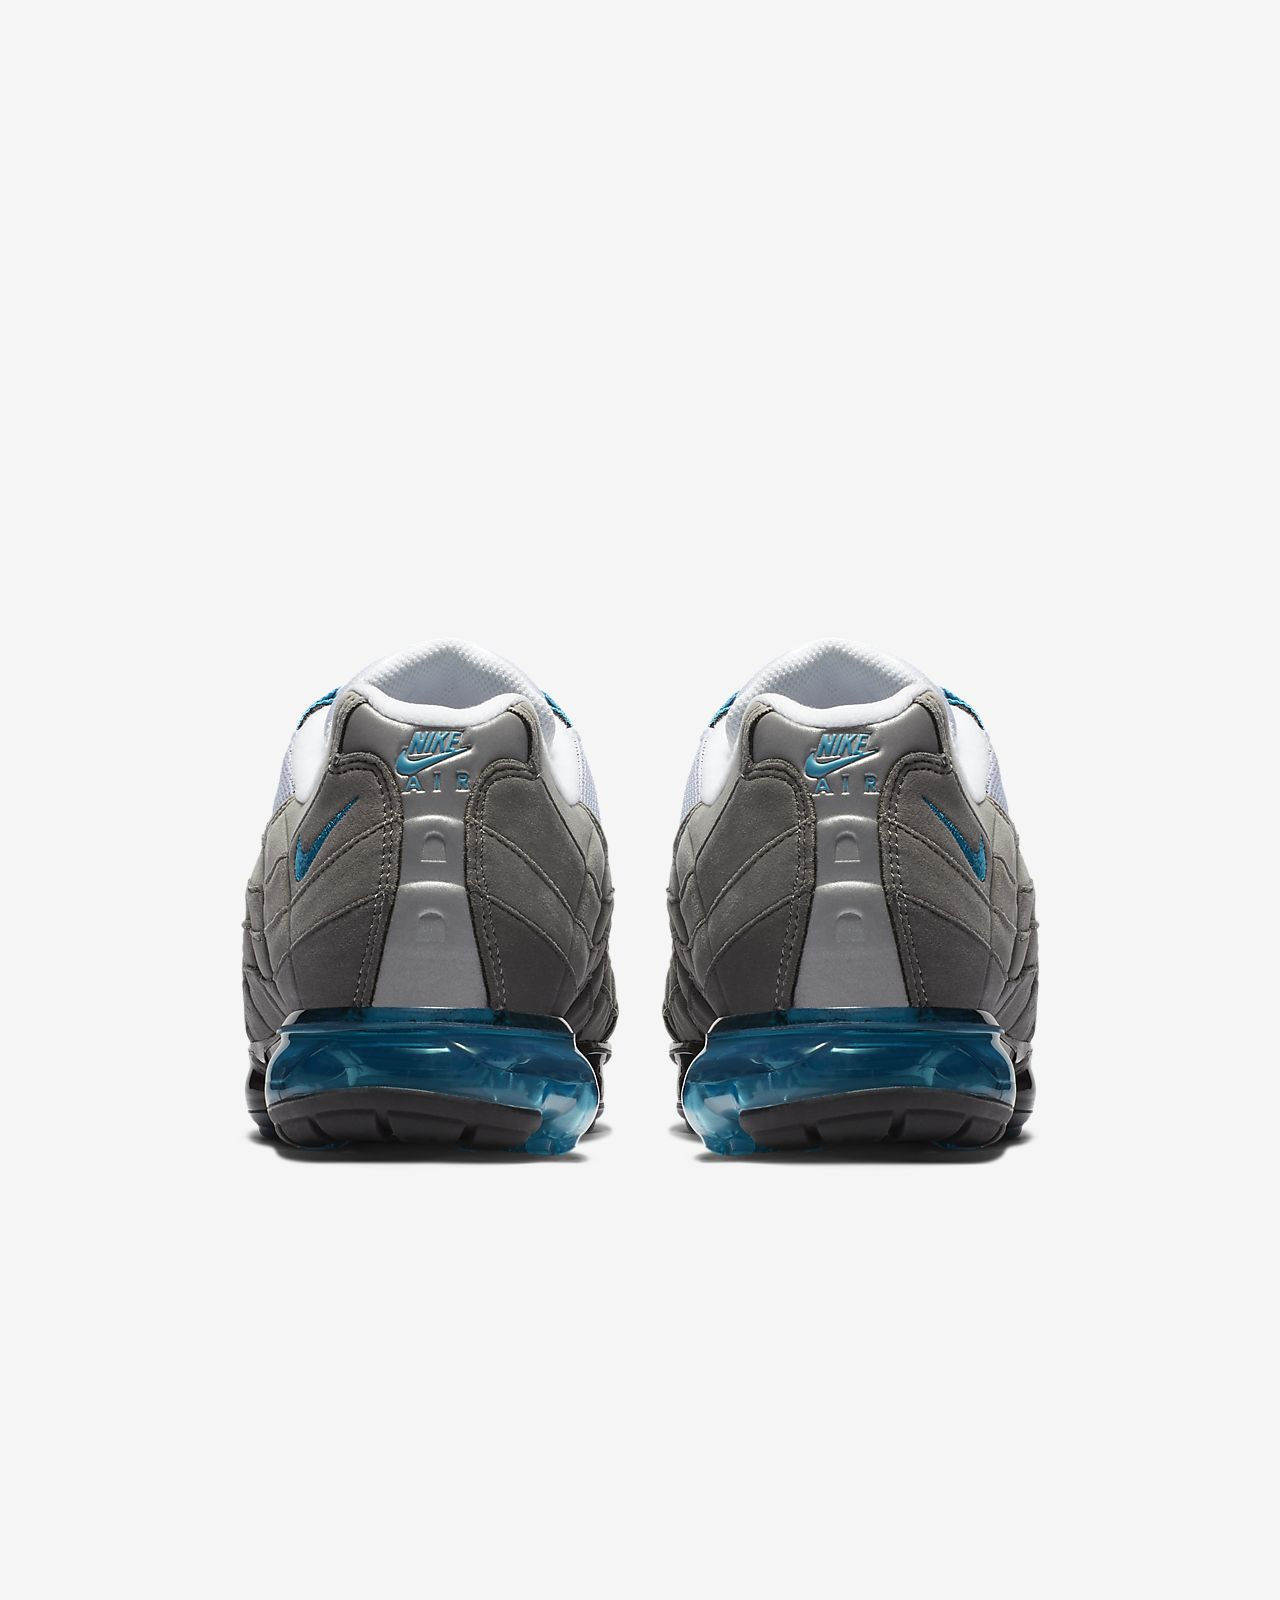 36b1dce0ec66cb Nike Air VaporMax 95 Men s Shoe. Nike.com GB